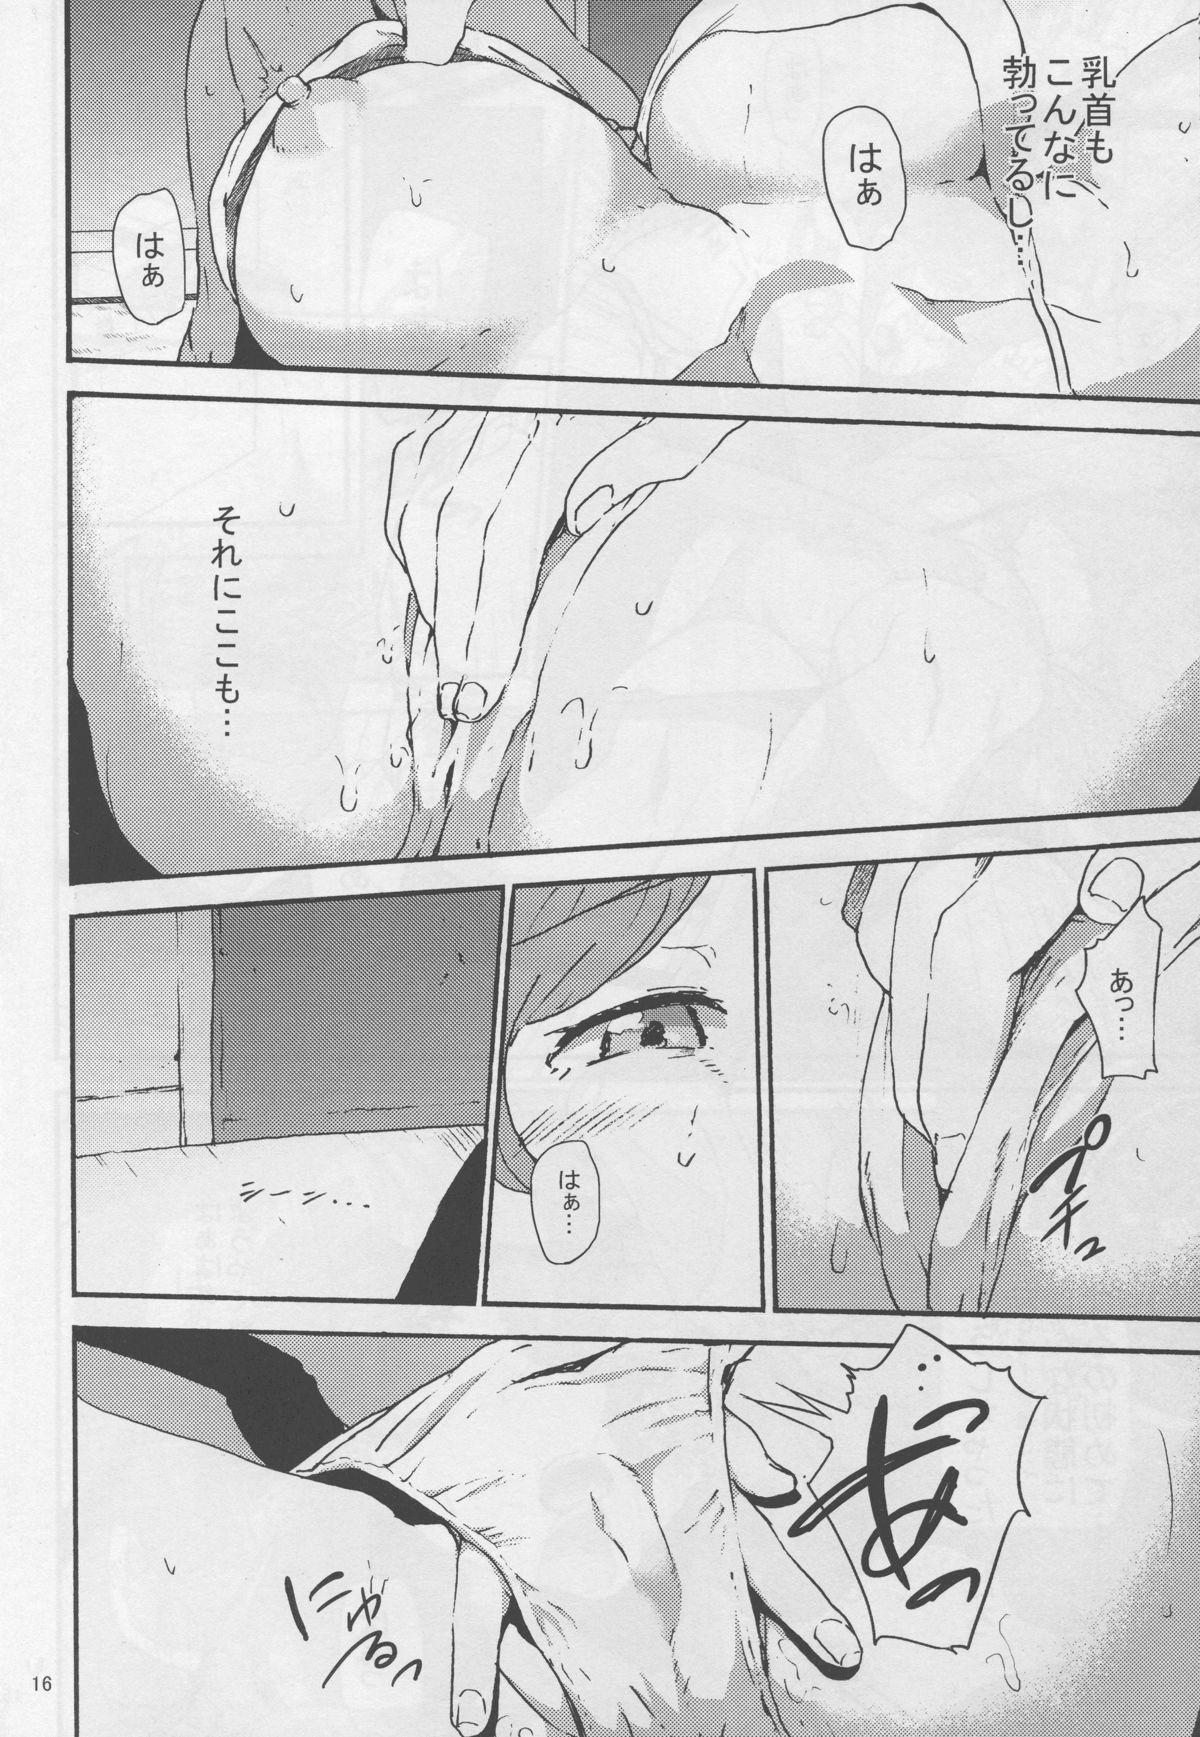 Mirai-chan ga Sandaime SGOCK no Leader ni Damasare Yarechau Hon 15